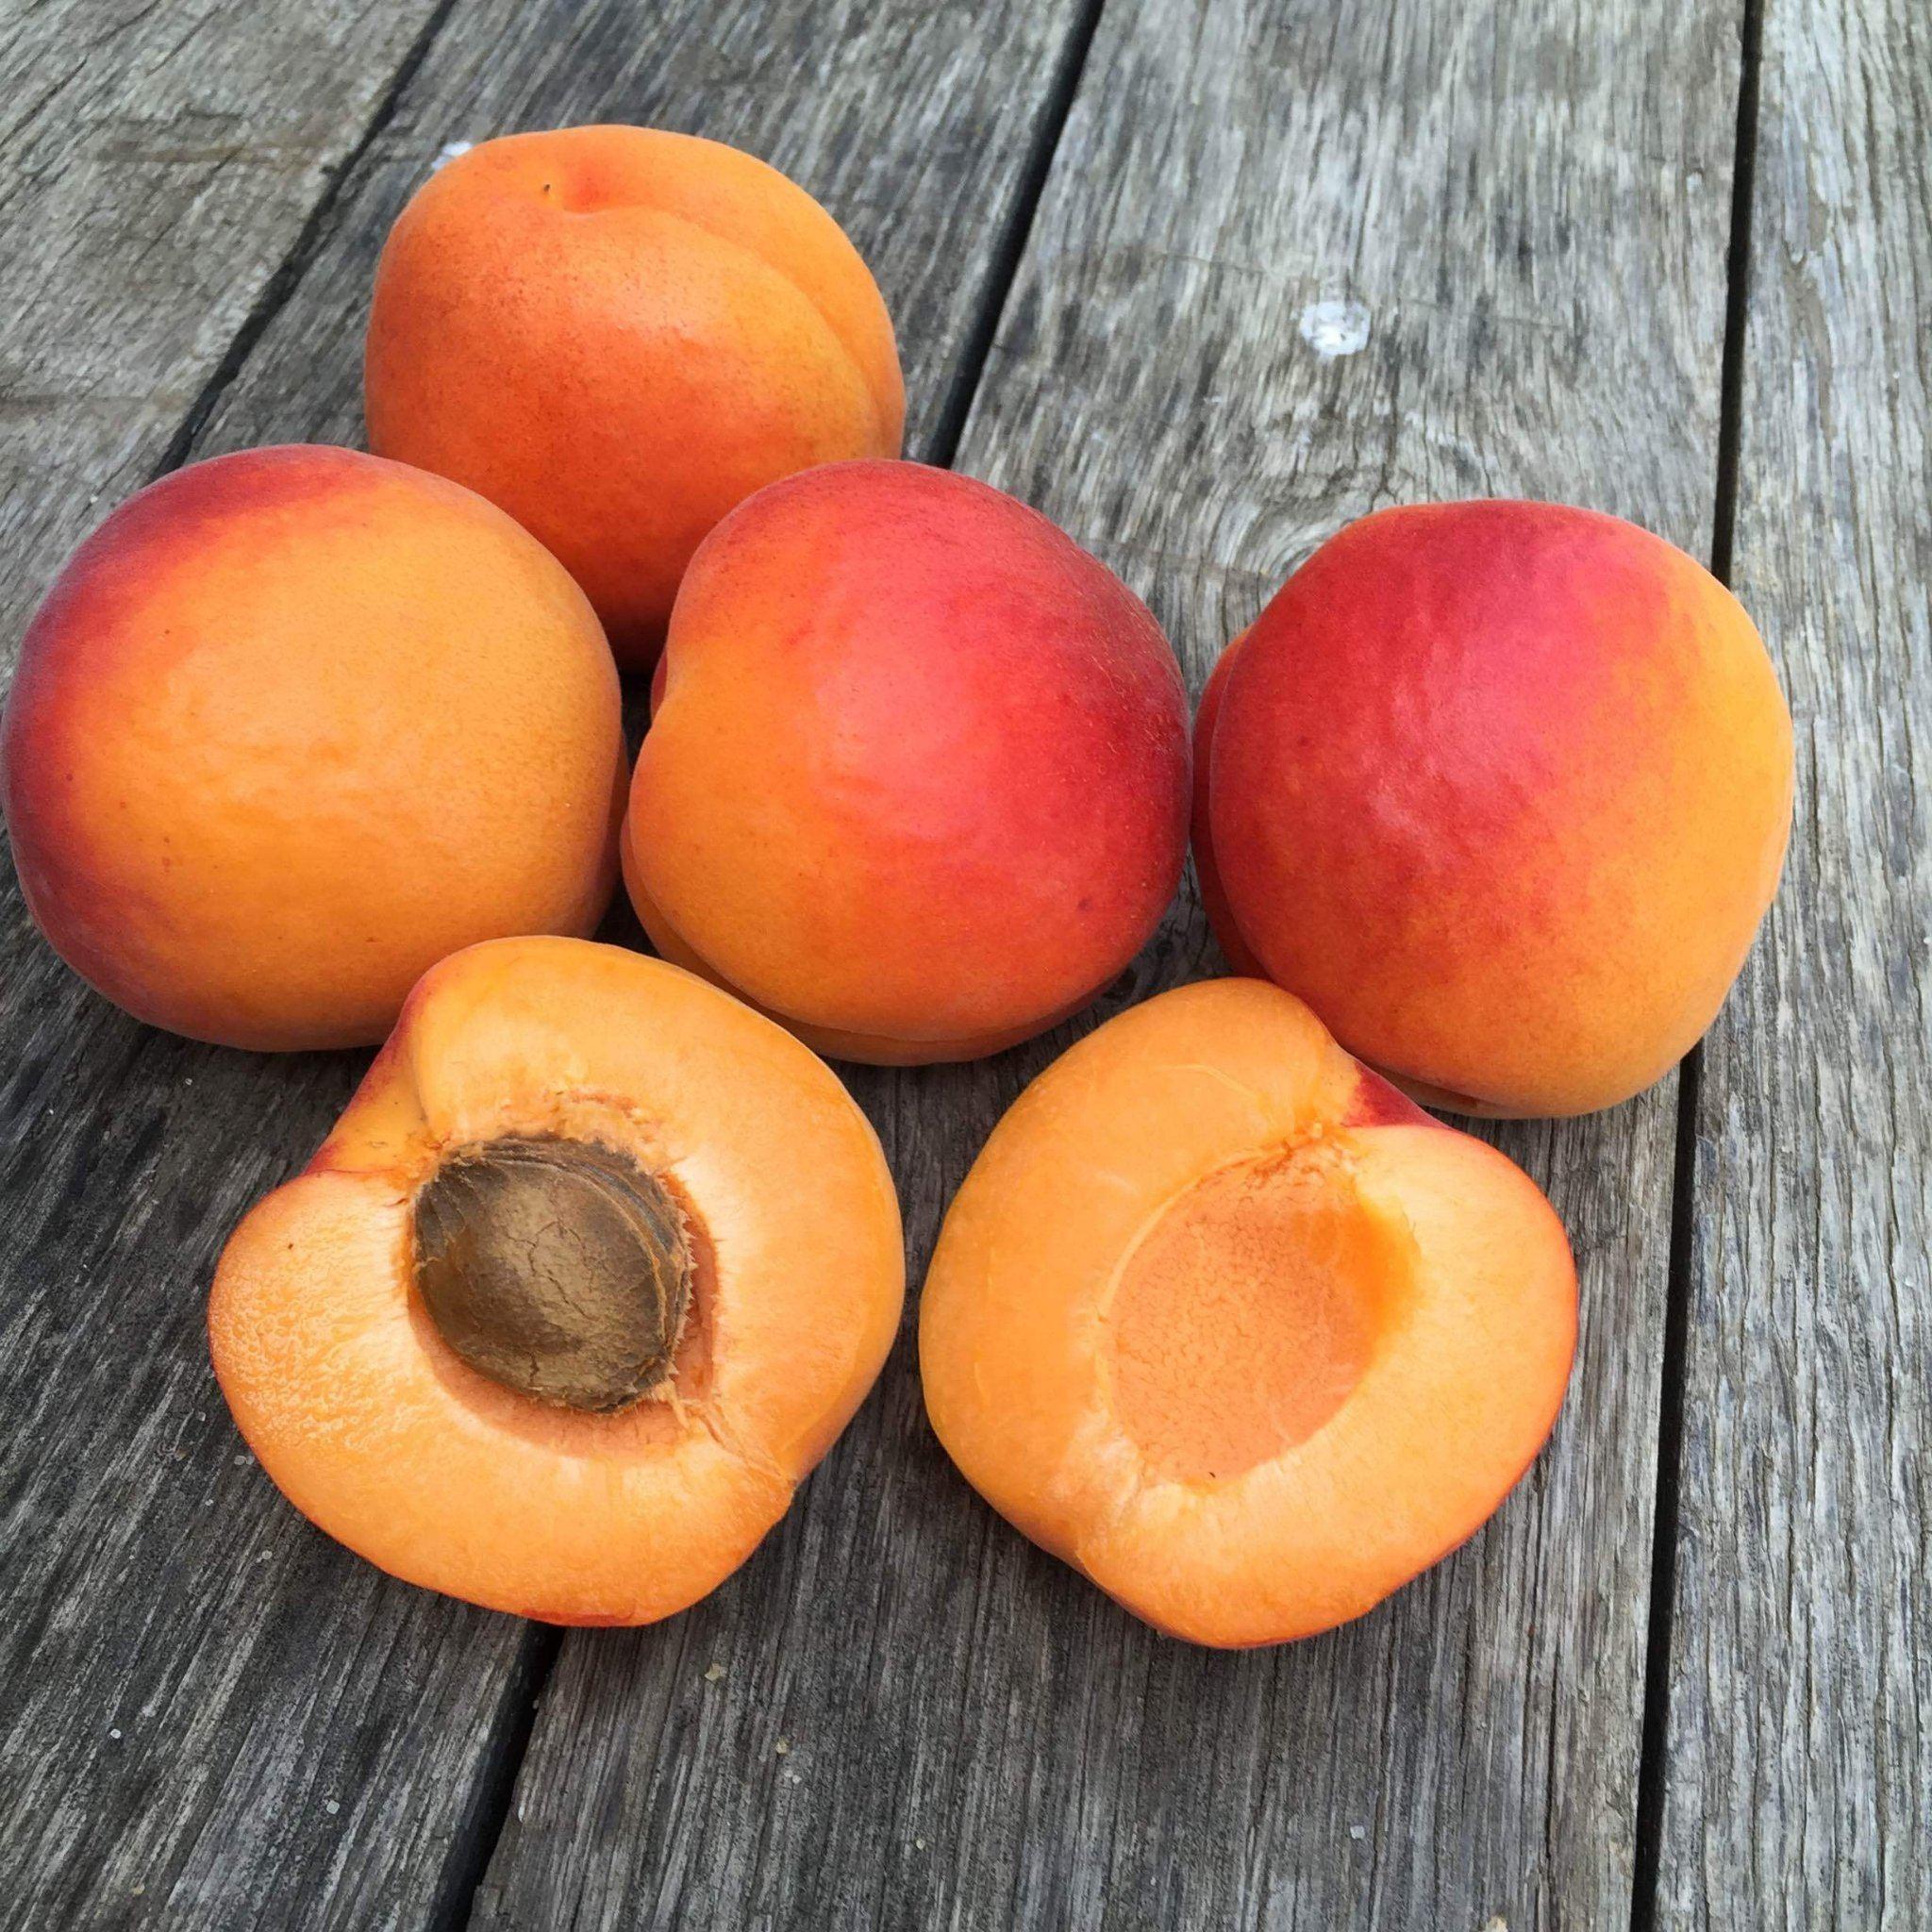 2021 Apricot Harvest | Organic Fruit Club | 2 Shipments